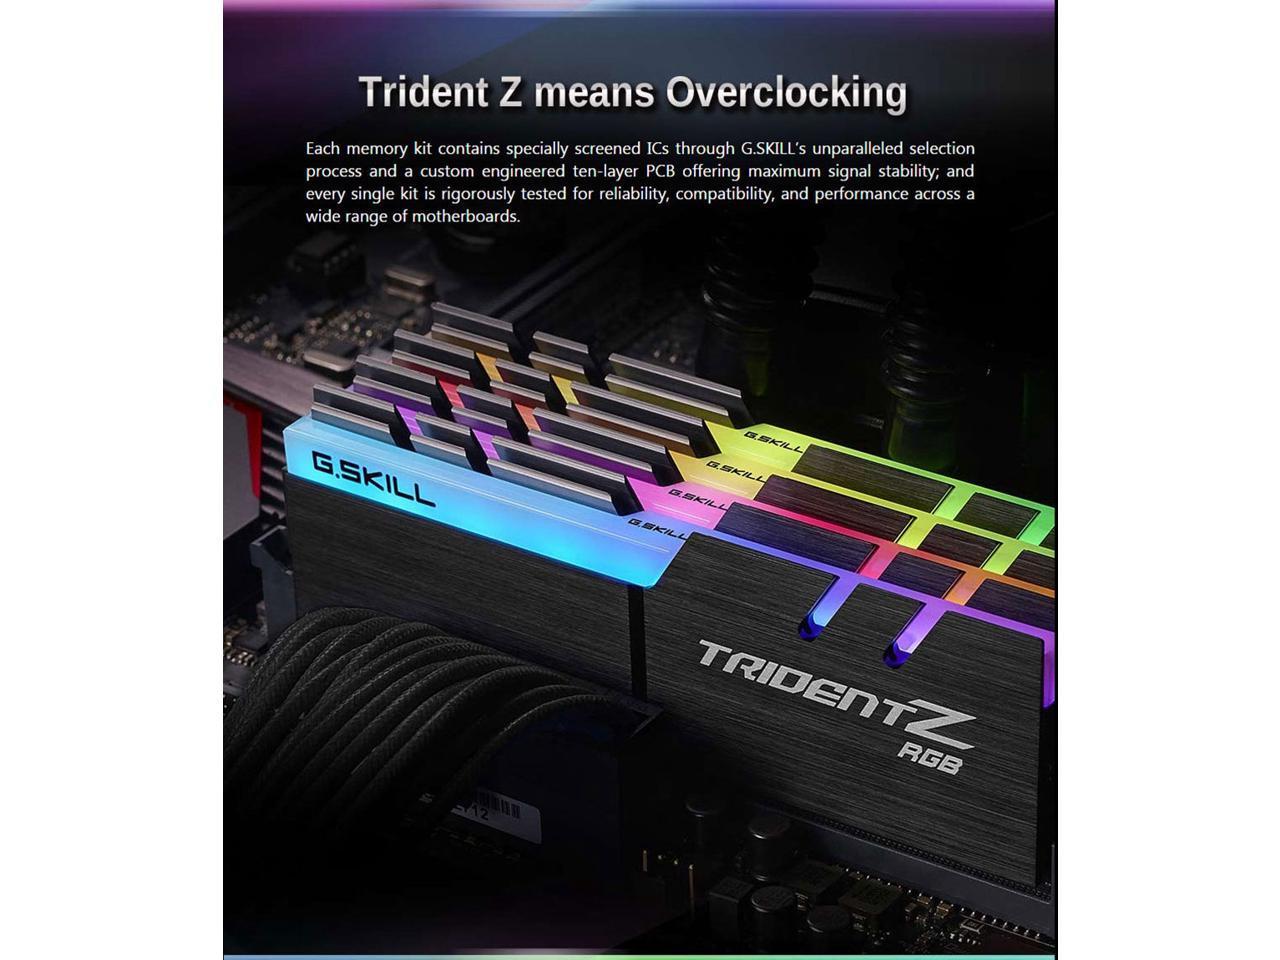 G SKILL TridentZ RGB 8GB (1 x 8GB) DDR4 3200MHz Desktop RAM -  F4-3200C16S-8GTZR (2 Years Warranty)